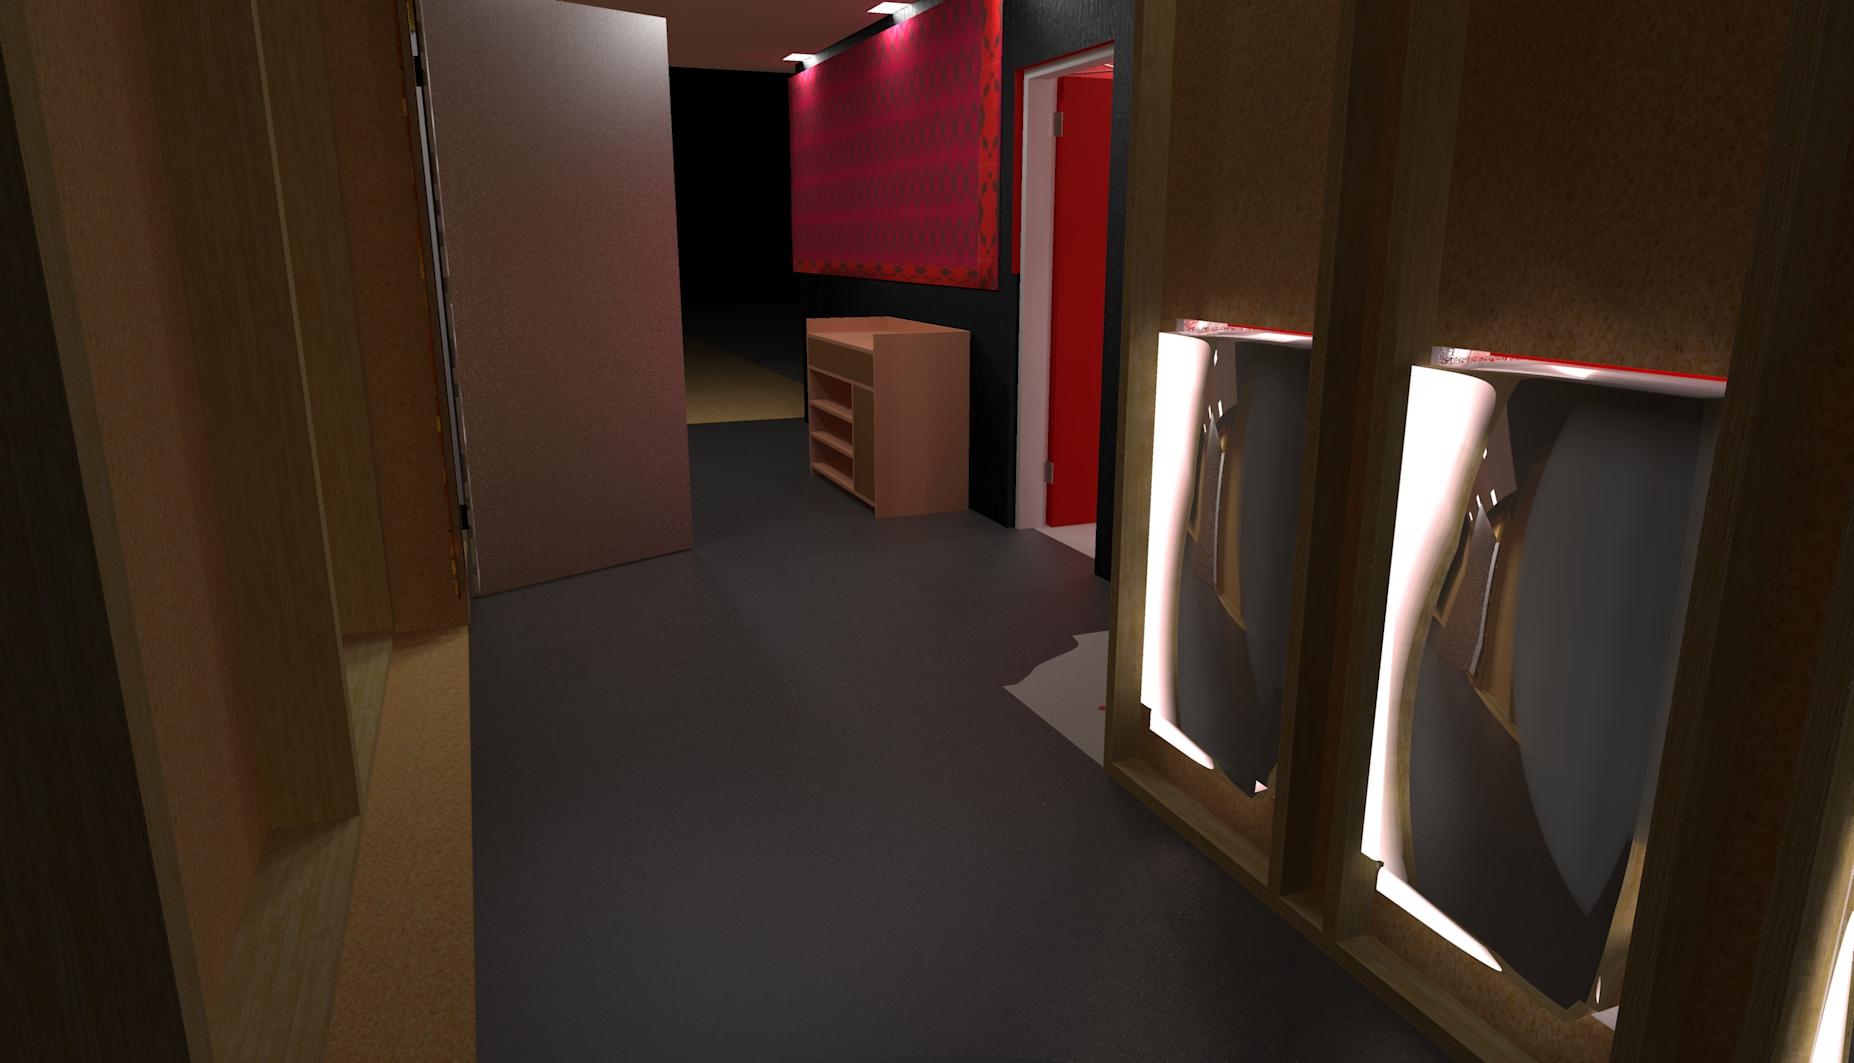 corridor of the red bathroom